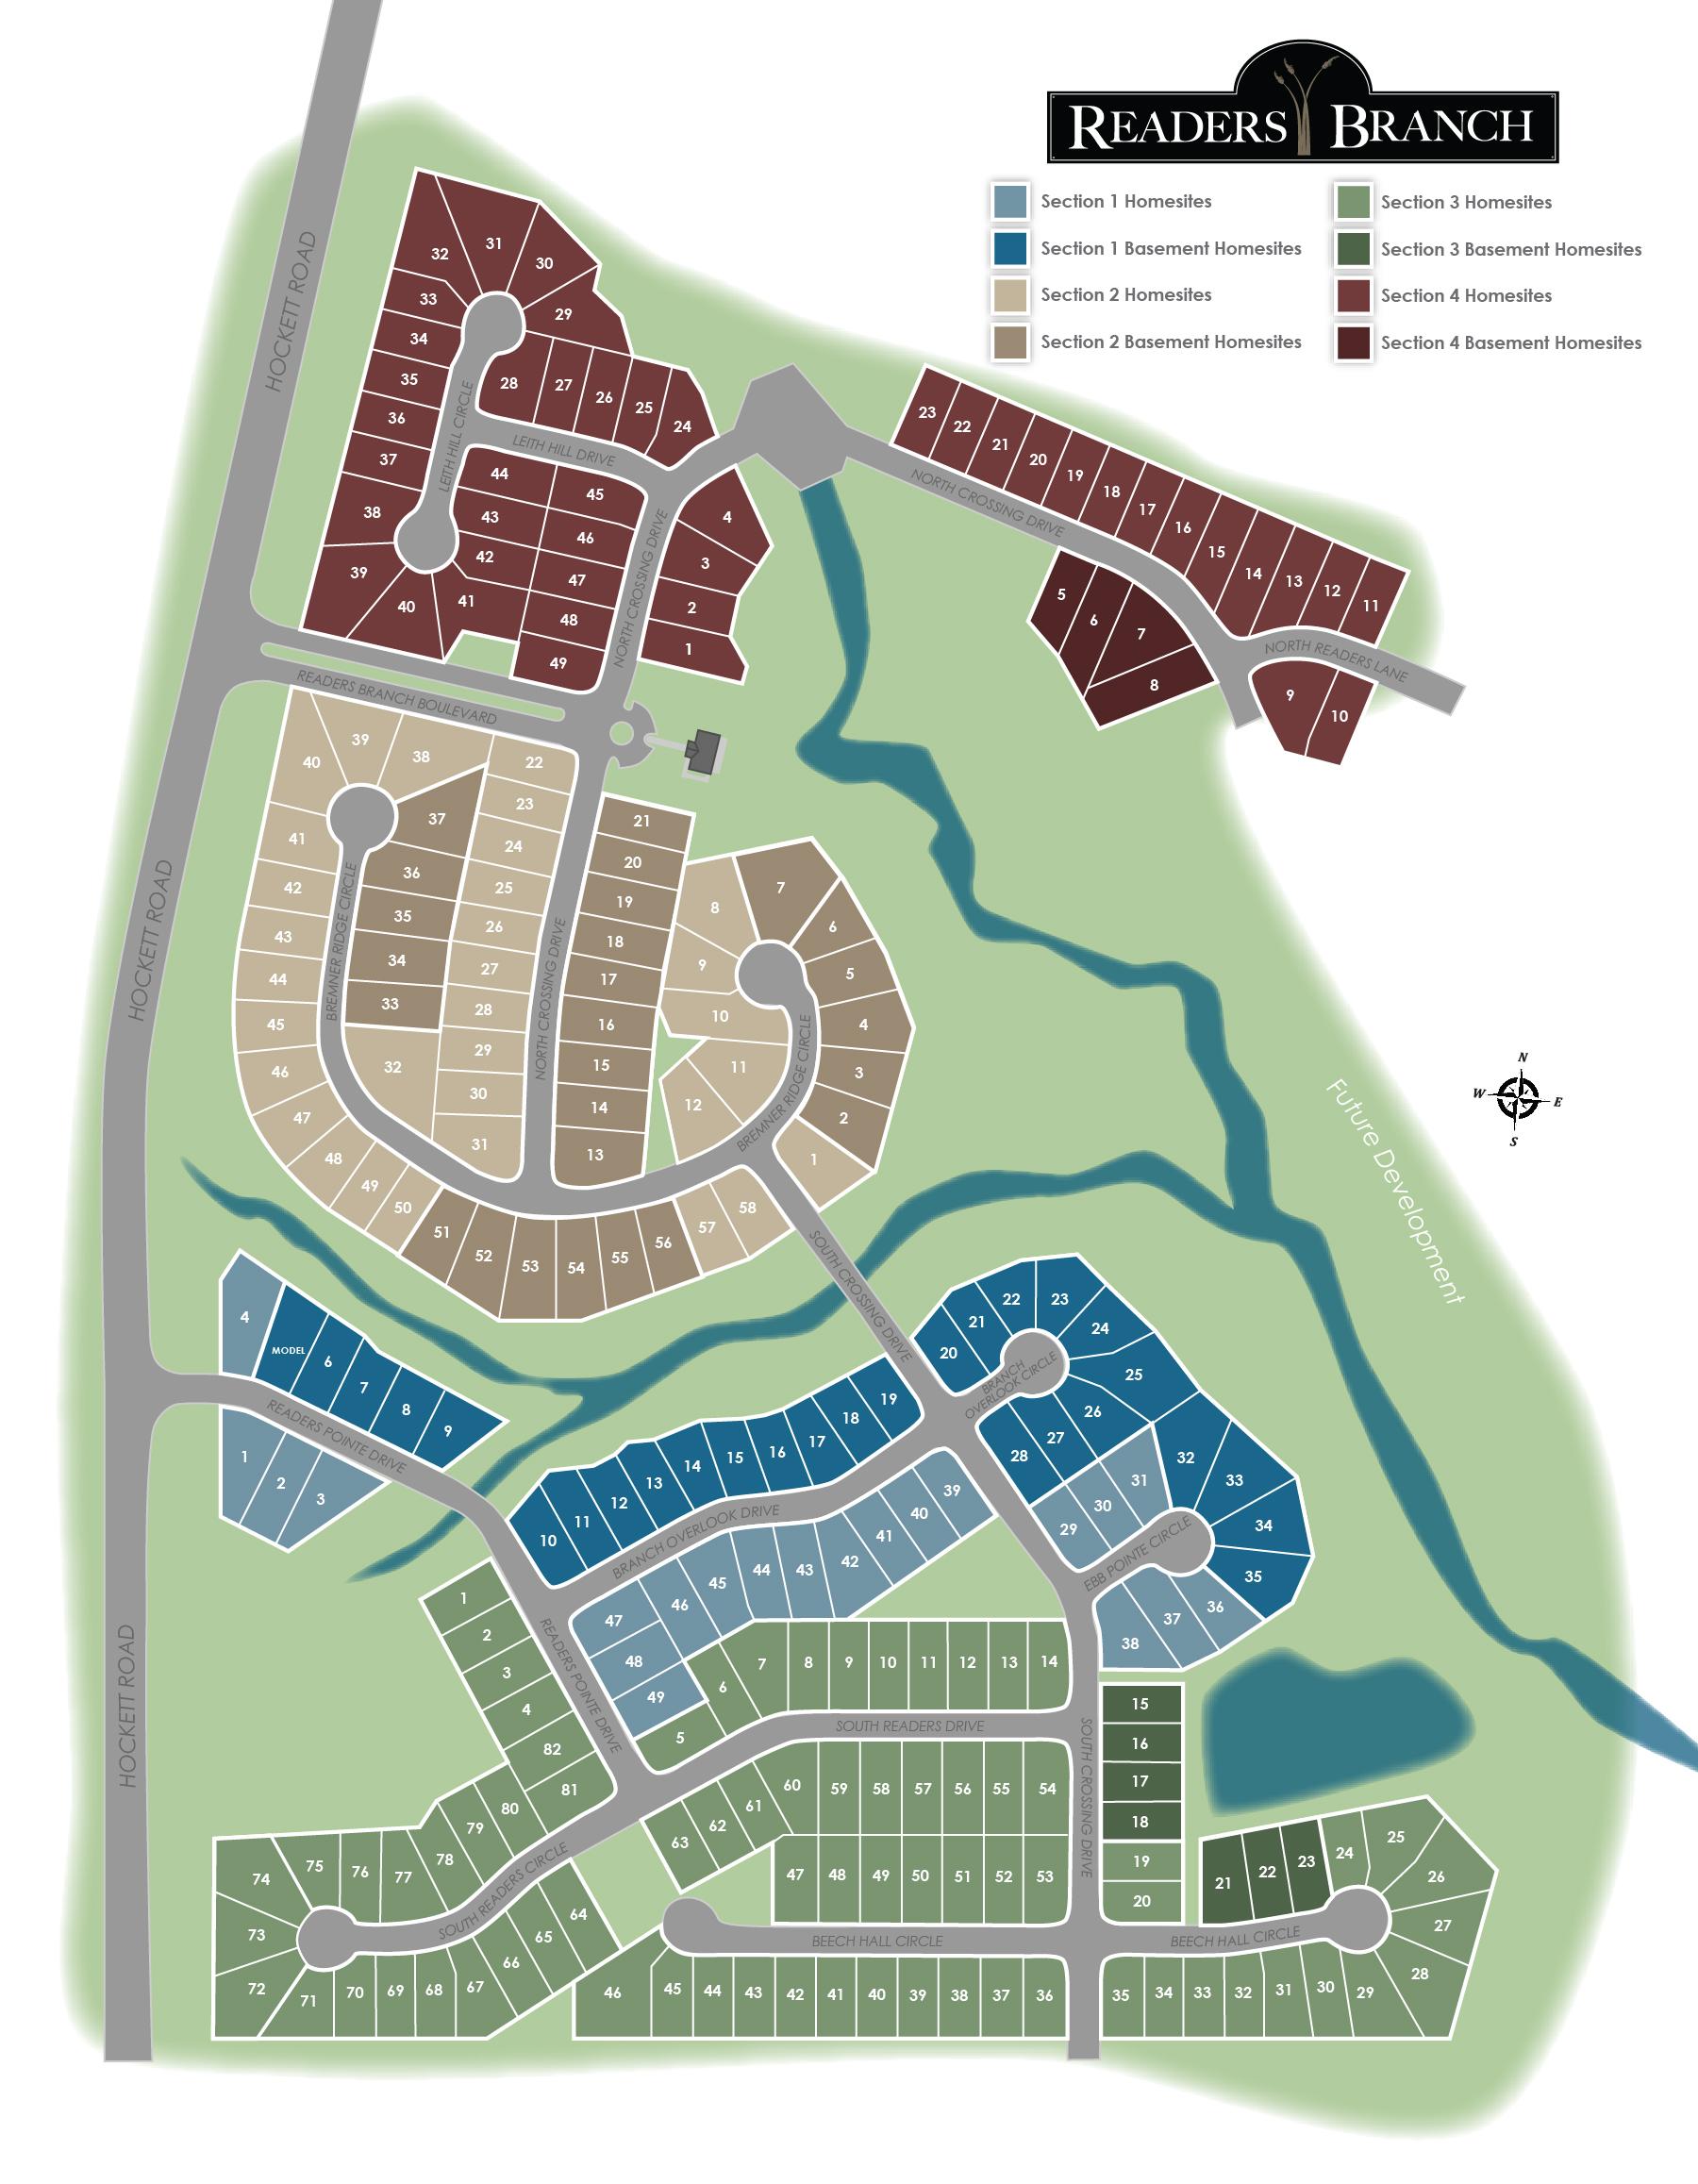 Manakin-Sabot, VA Readers Branch New Homes from Eagle Construction